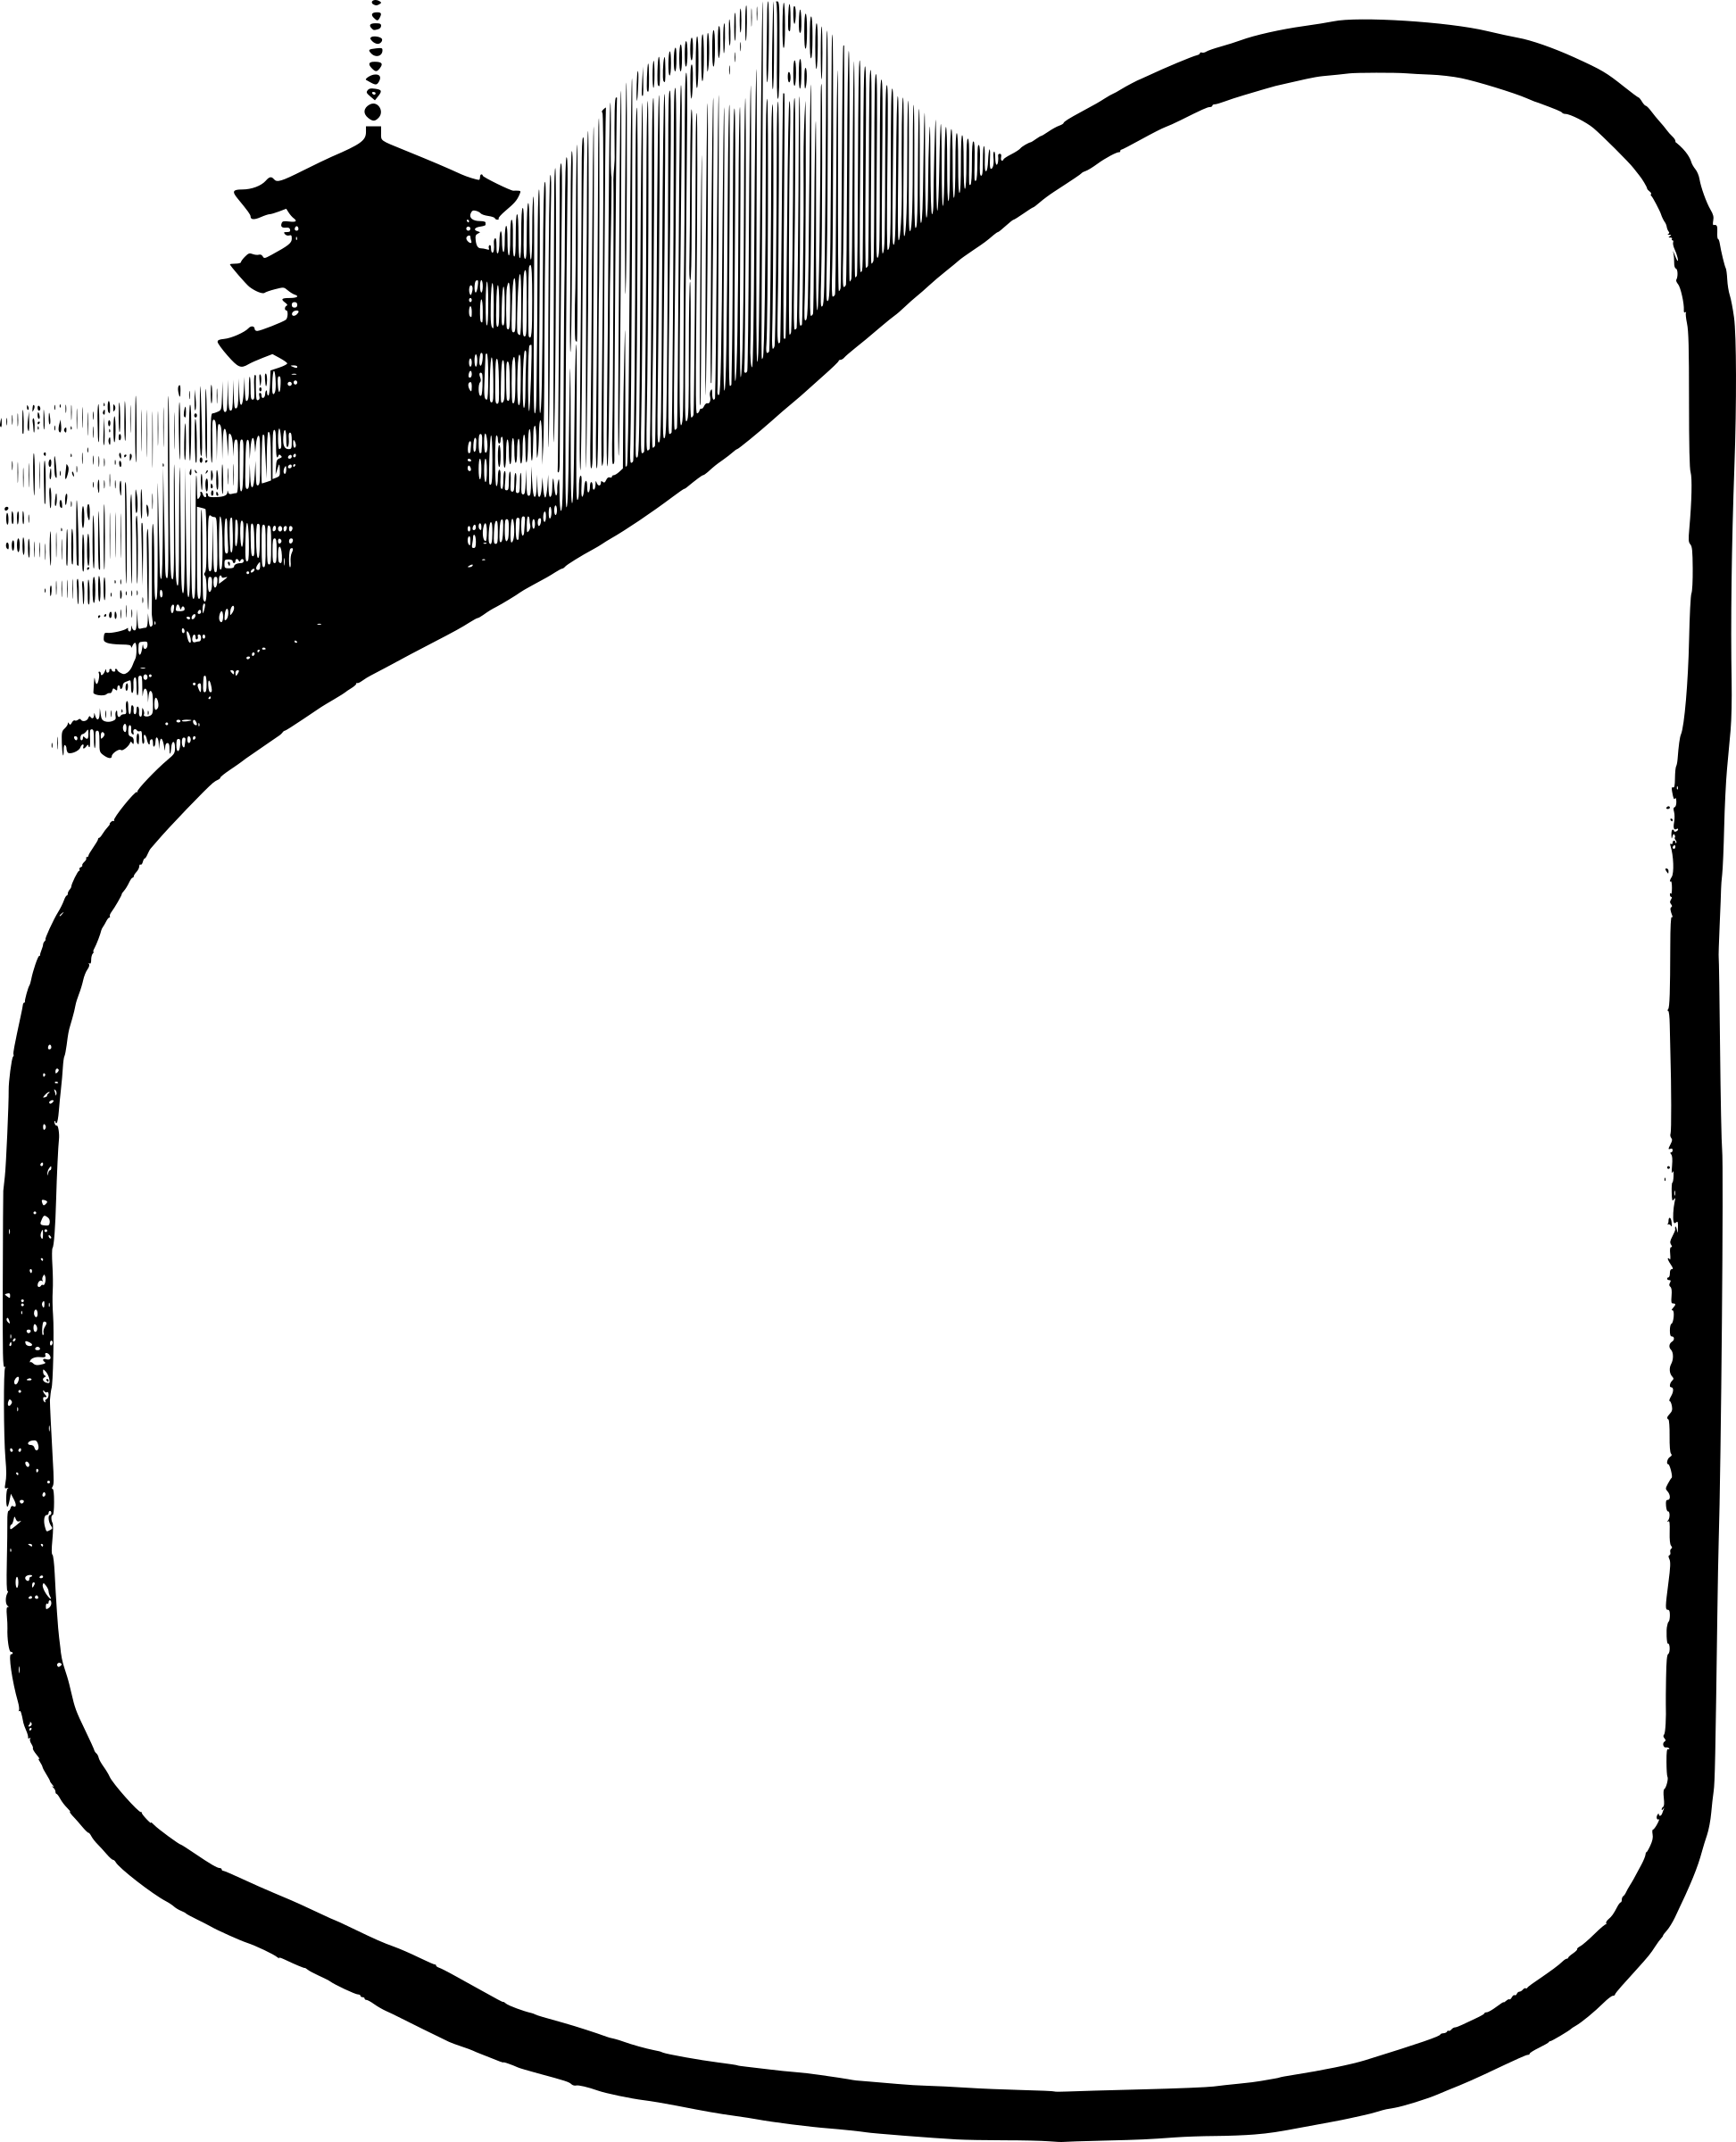 Japanese clipart border. Simple frame big image